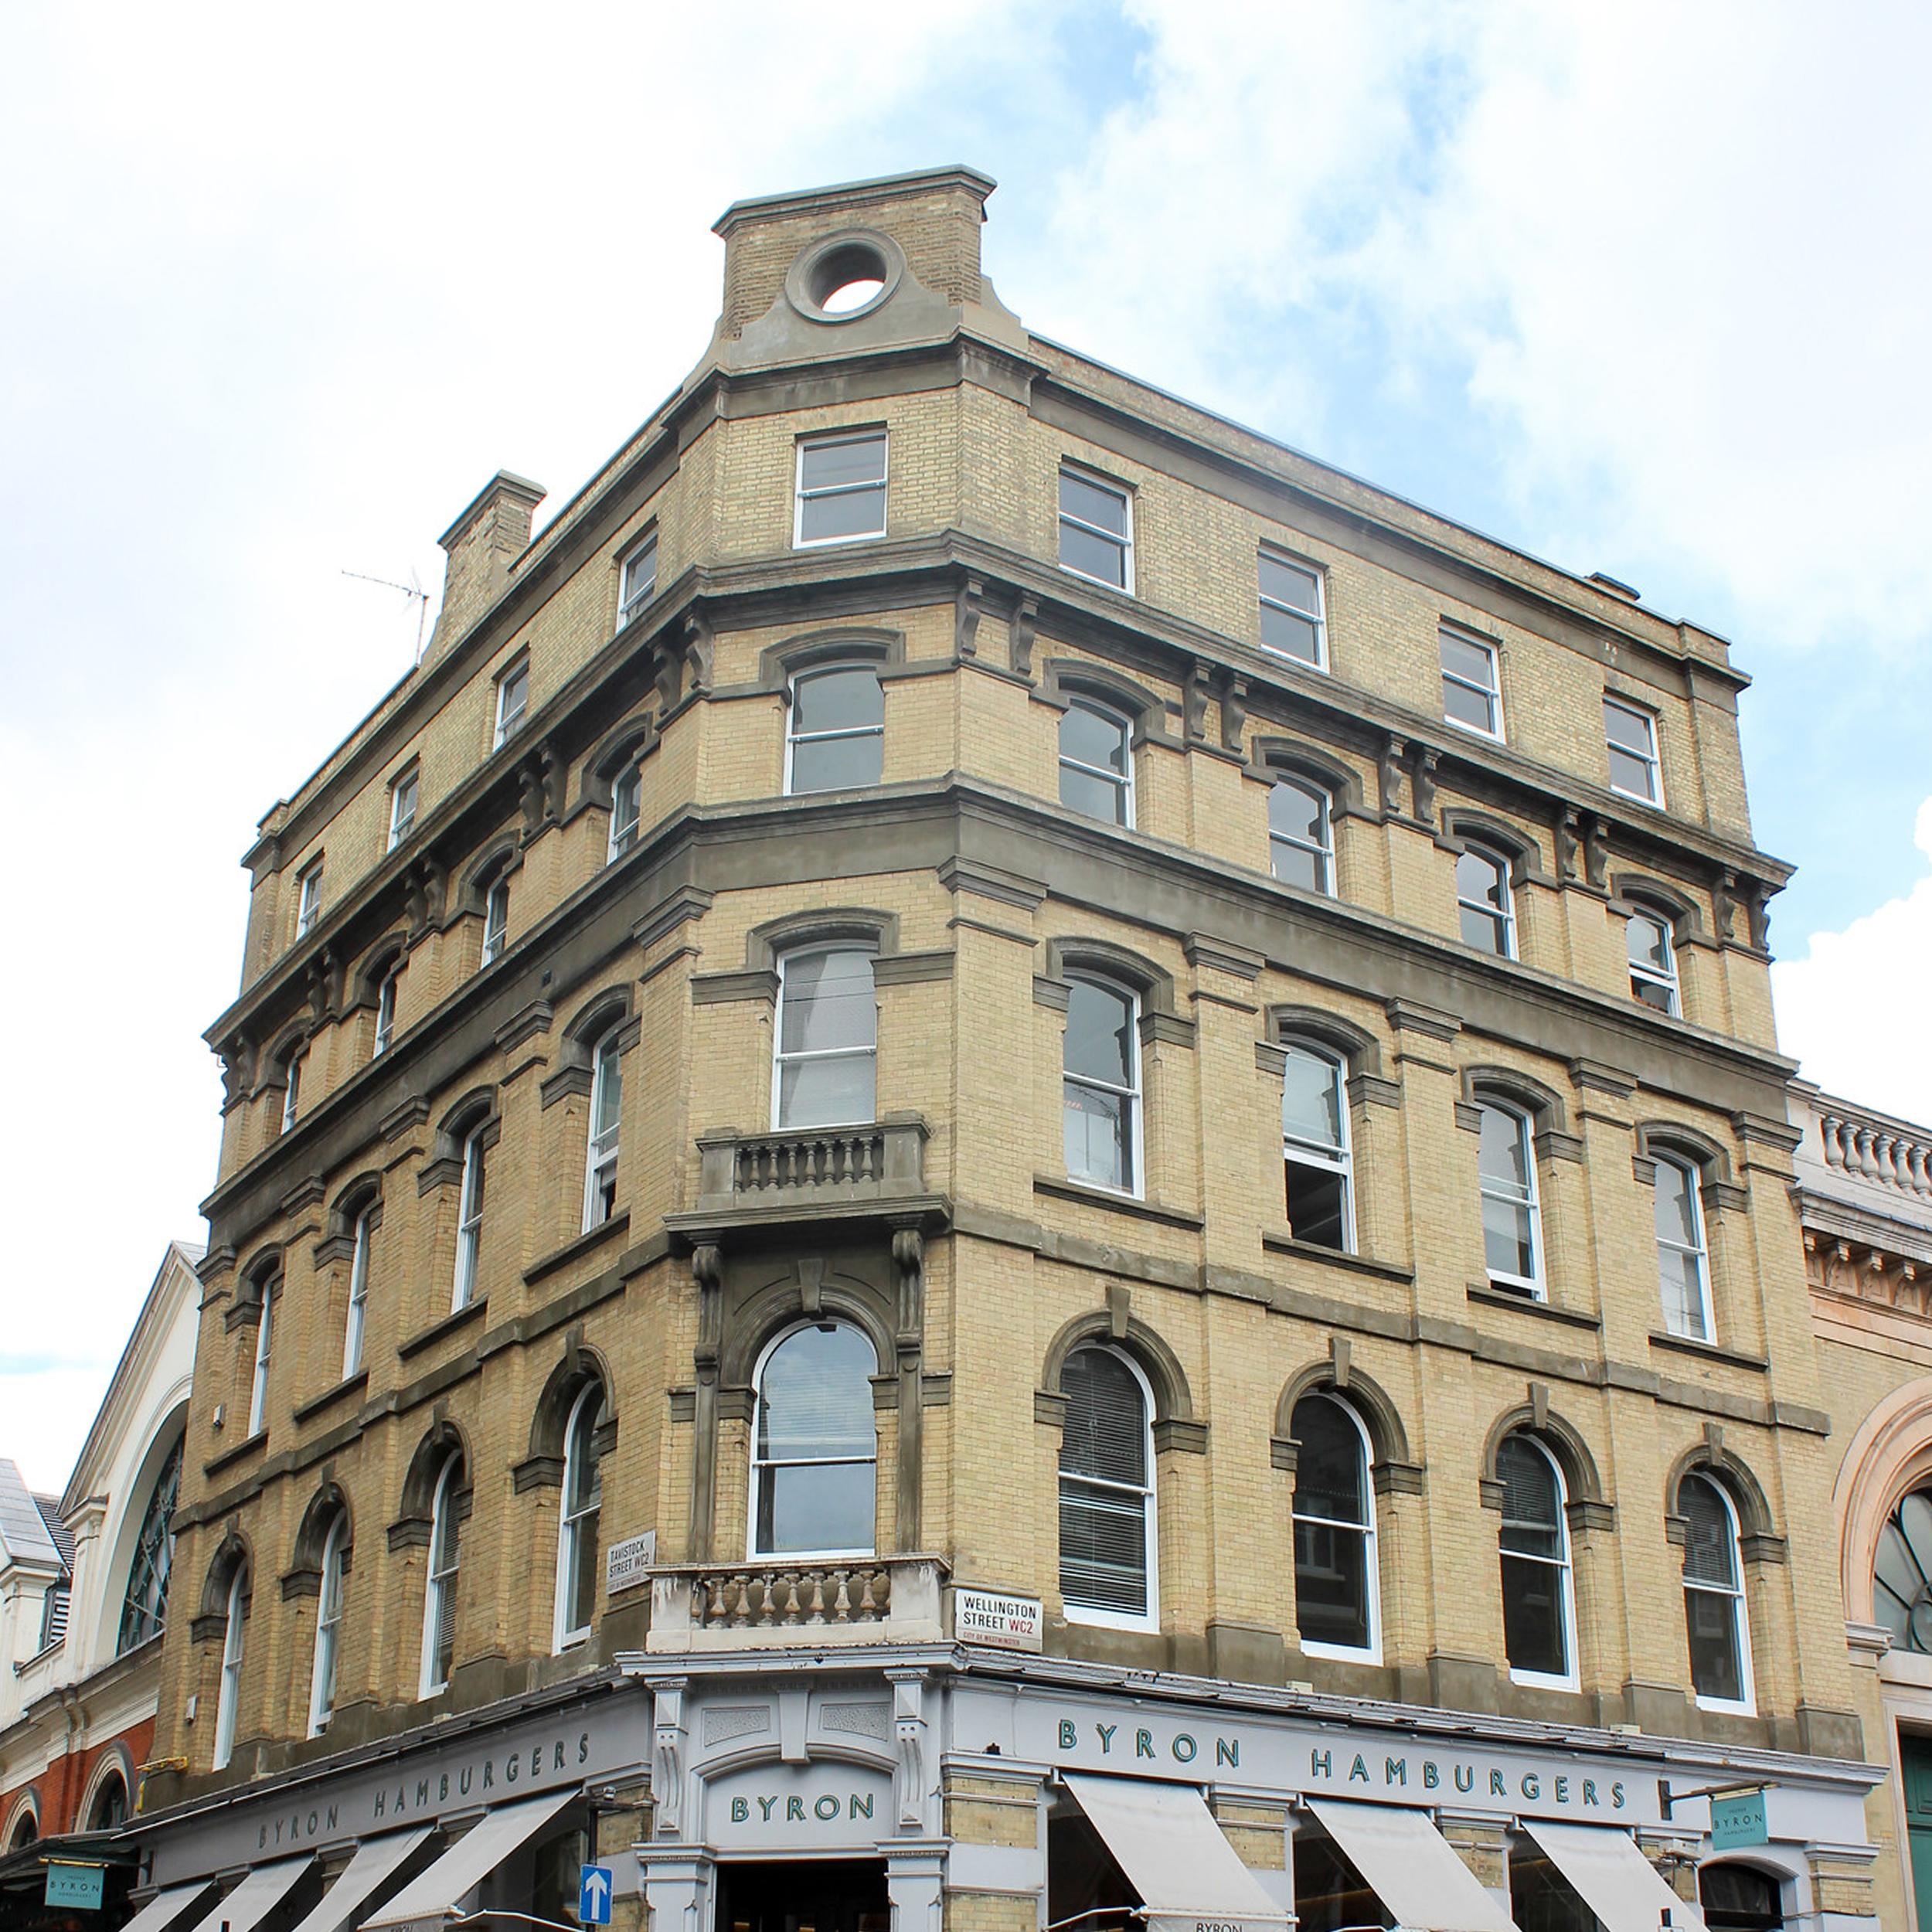 Large building in central London after exterior renovation works